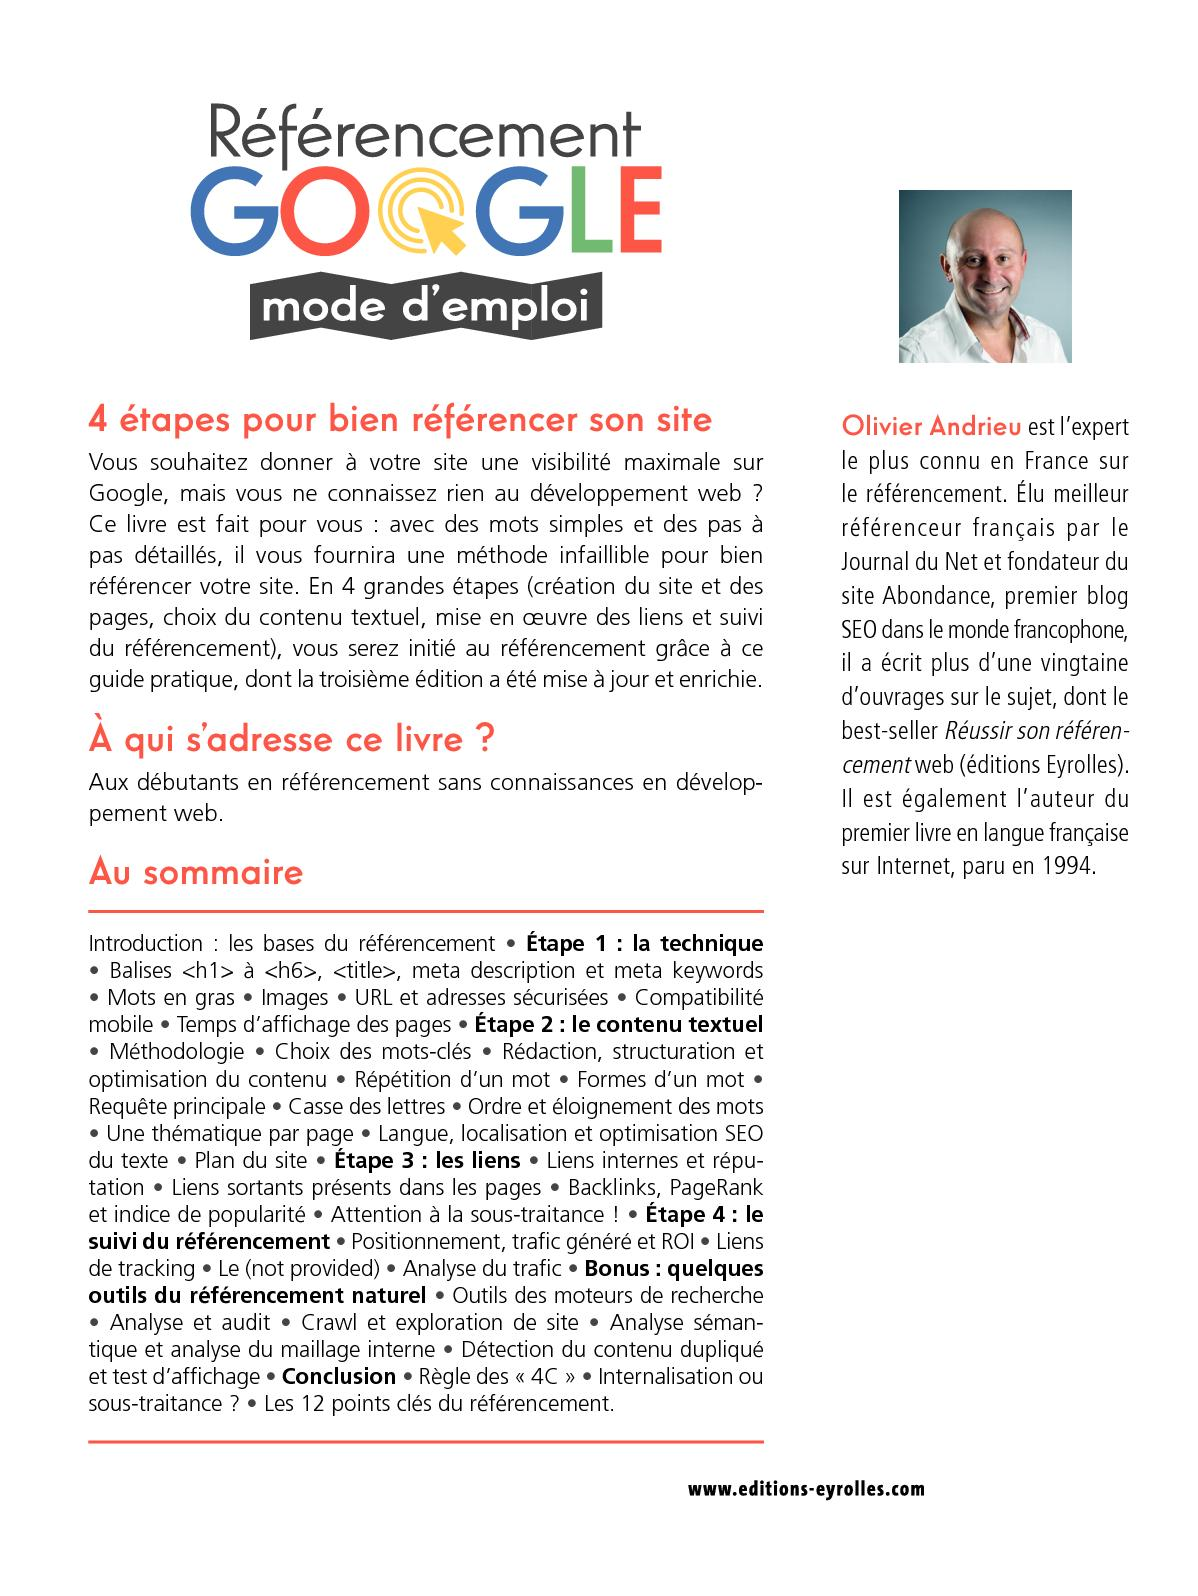 Extrait Referencement Google Mode D Emploi Calameo